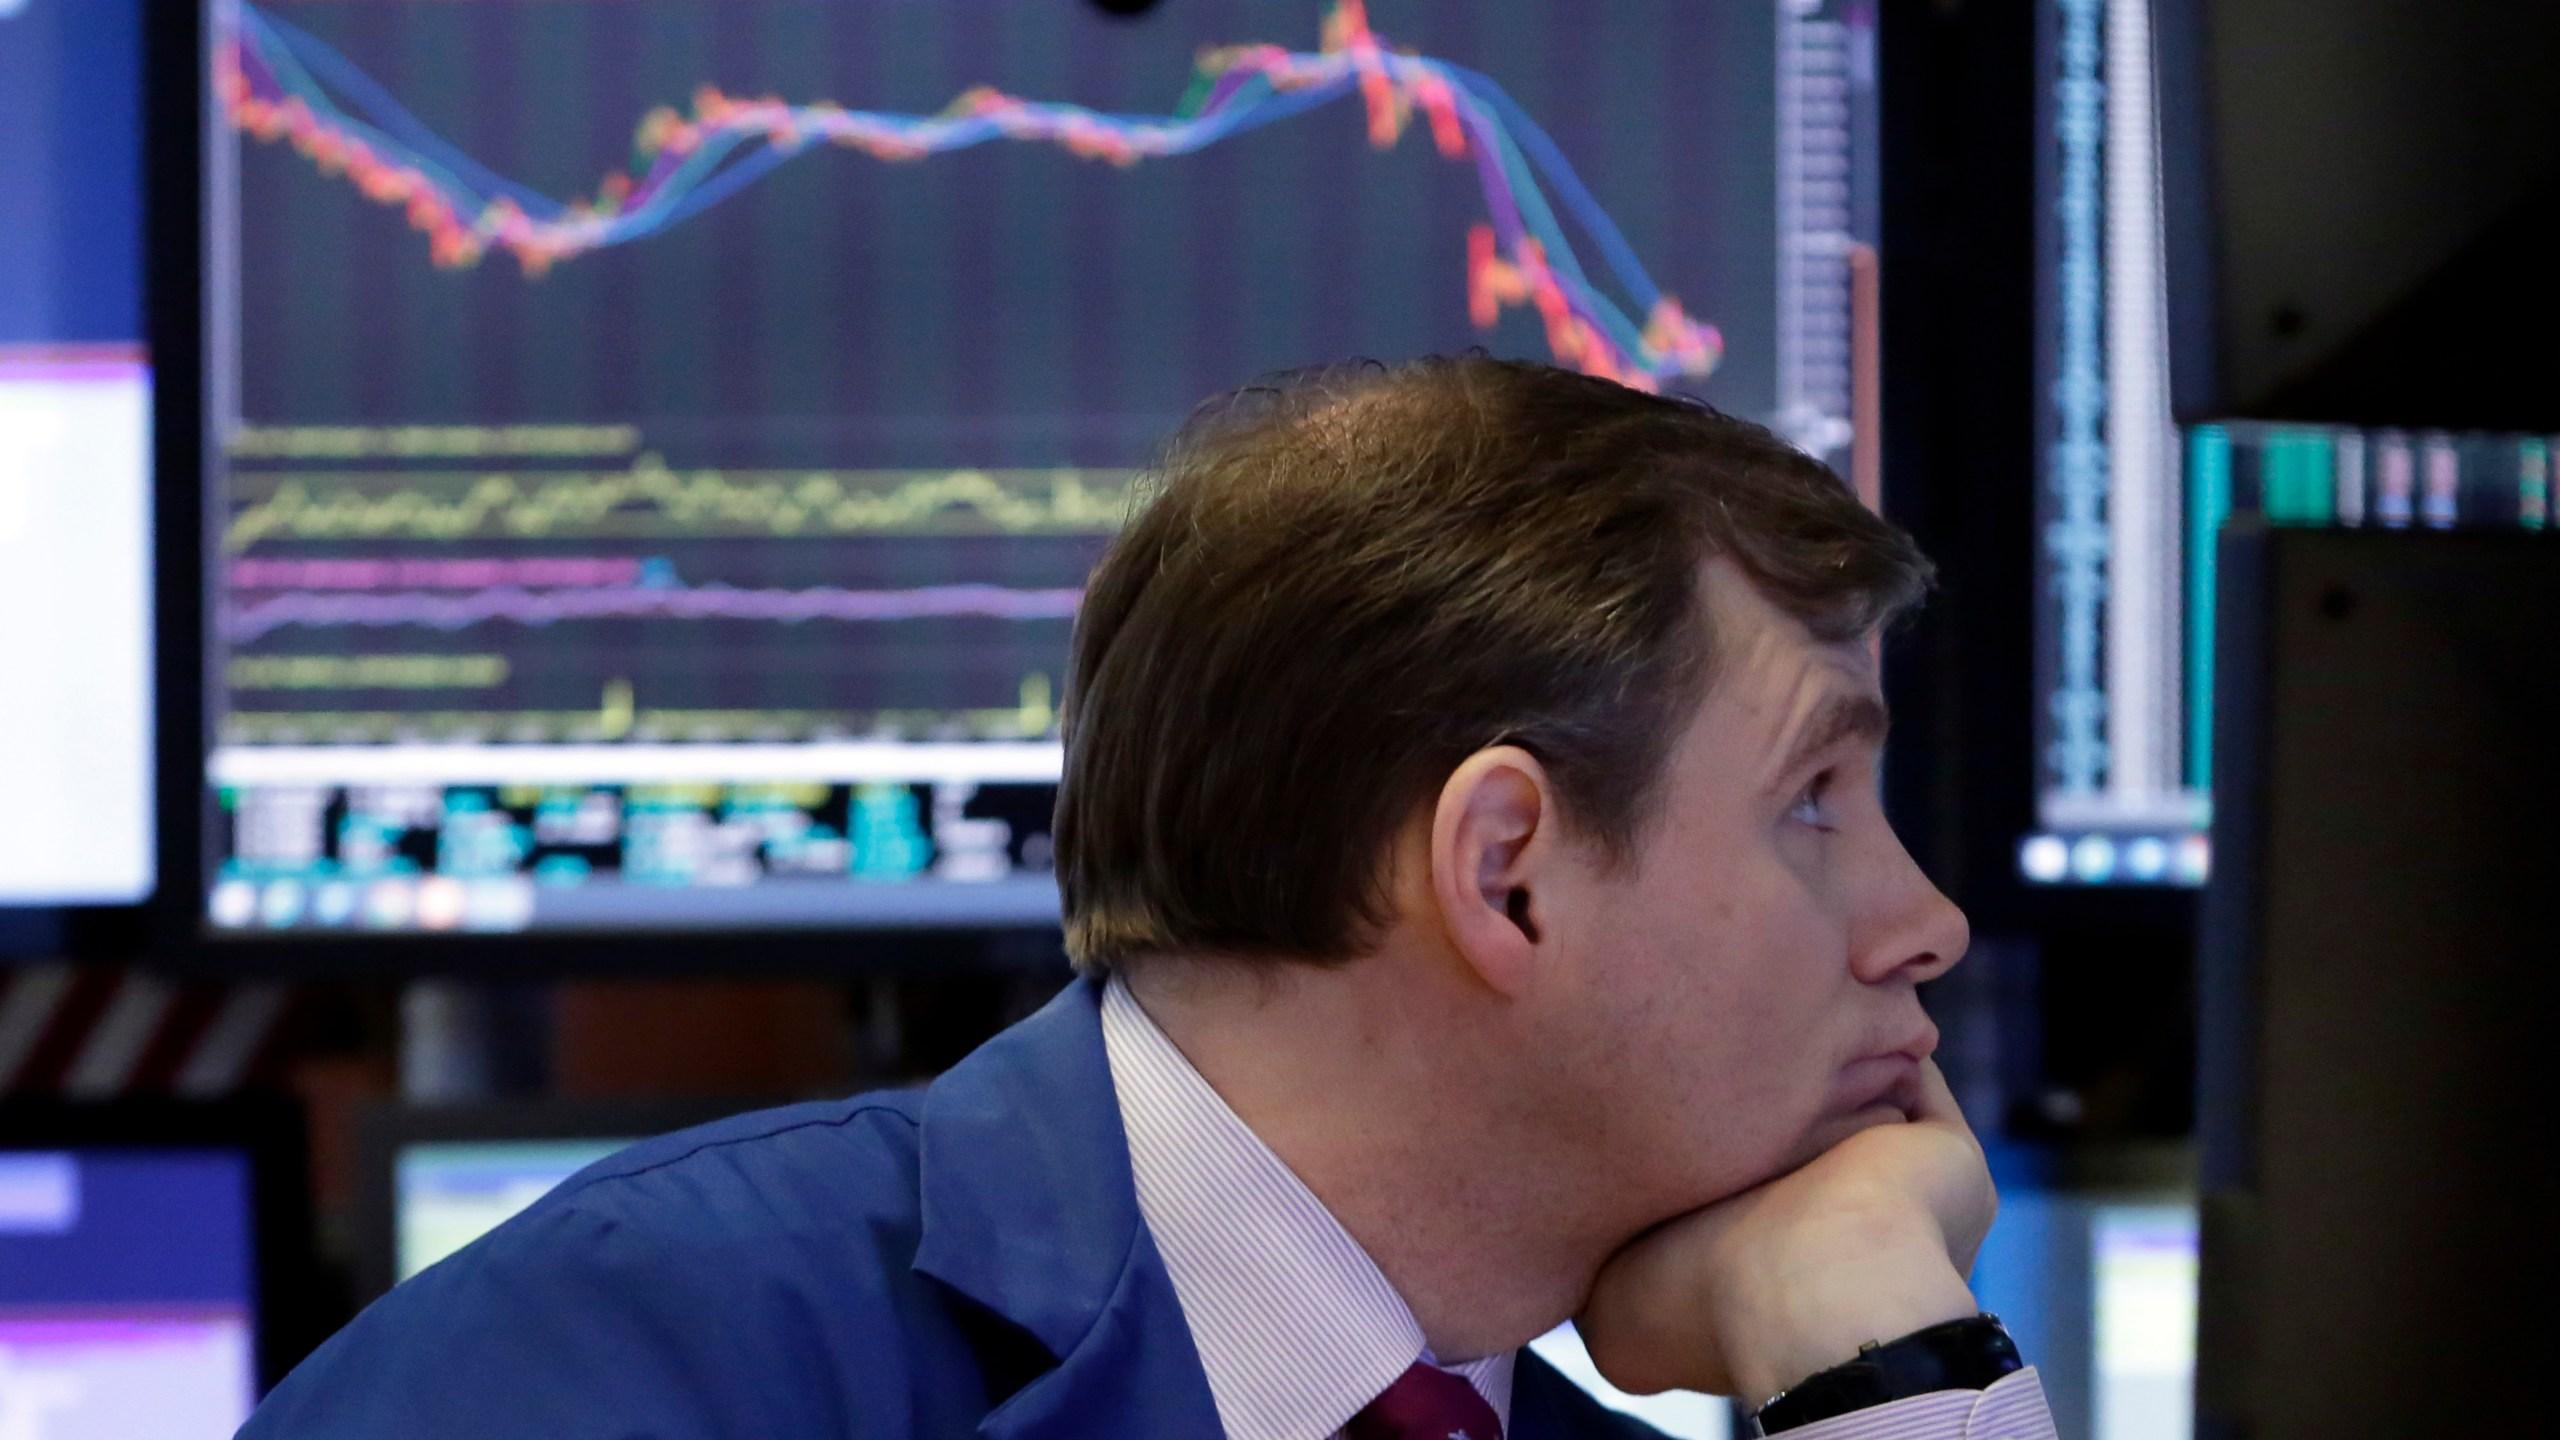 Financial_Markets_Wall_Street_06679-159532.jpg75810692